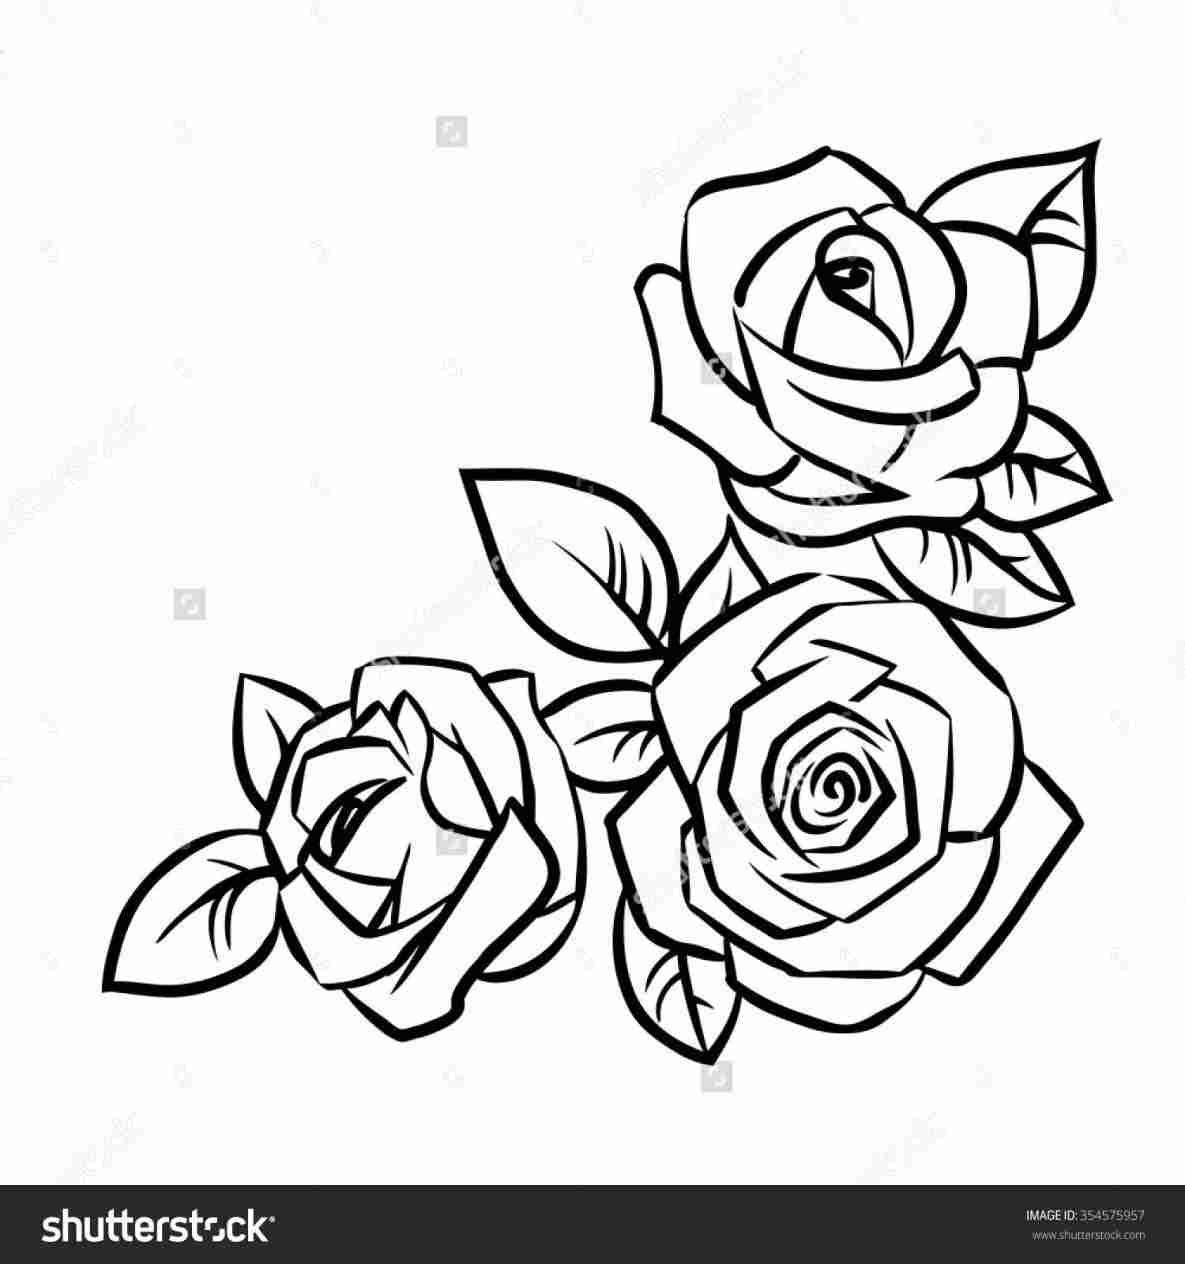 1185x1264 S Easy Black Rose Drawing With Vines Vine Tattoos Rhcom